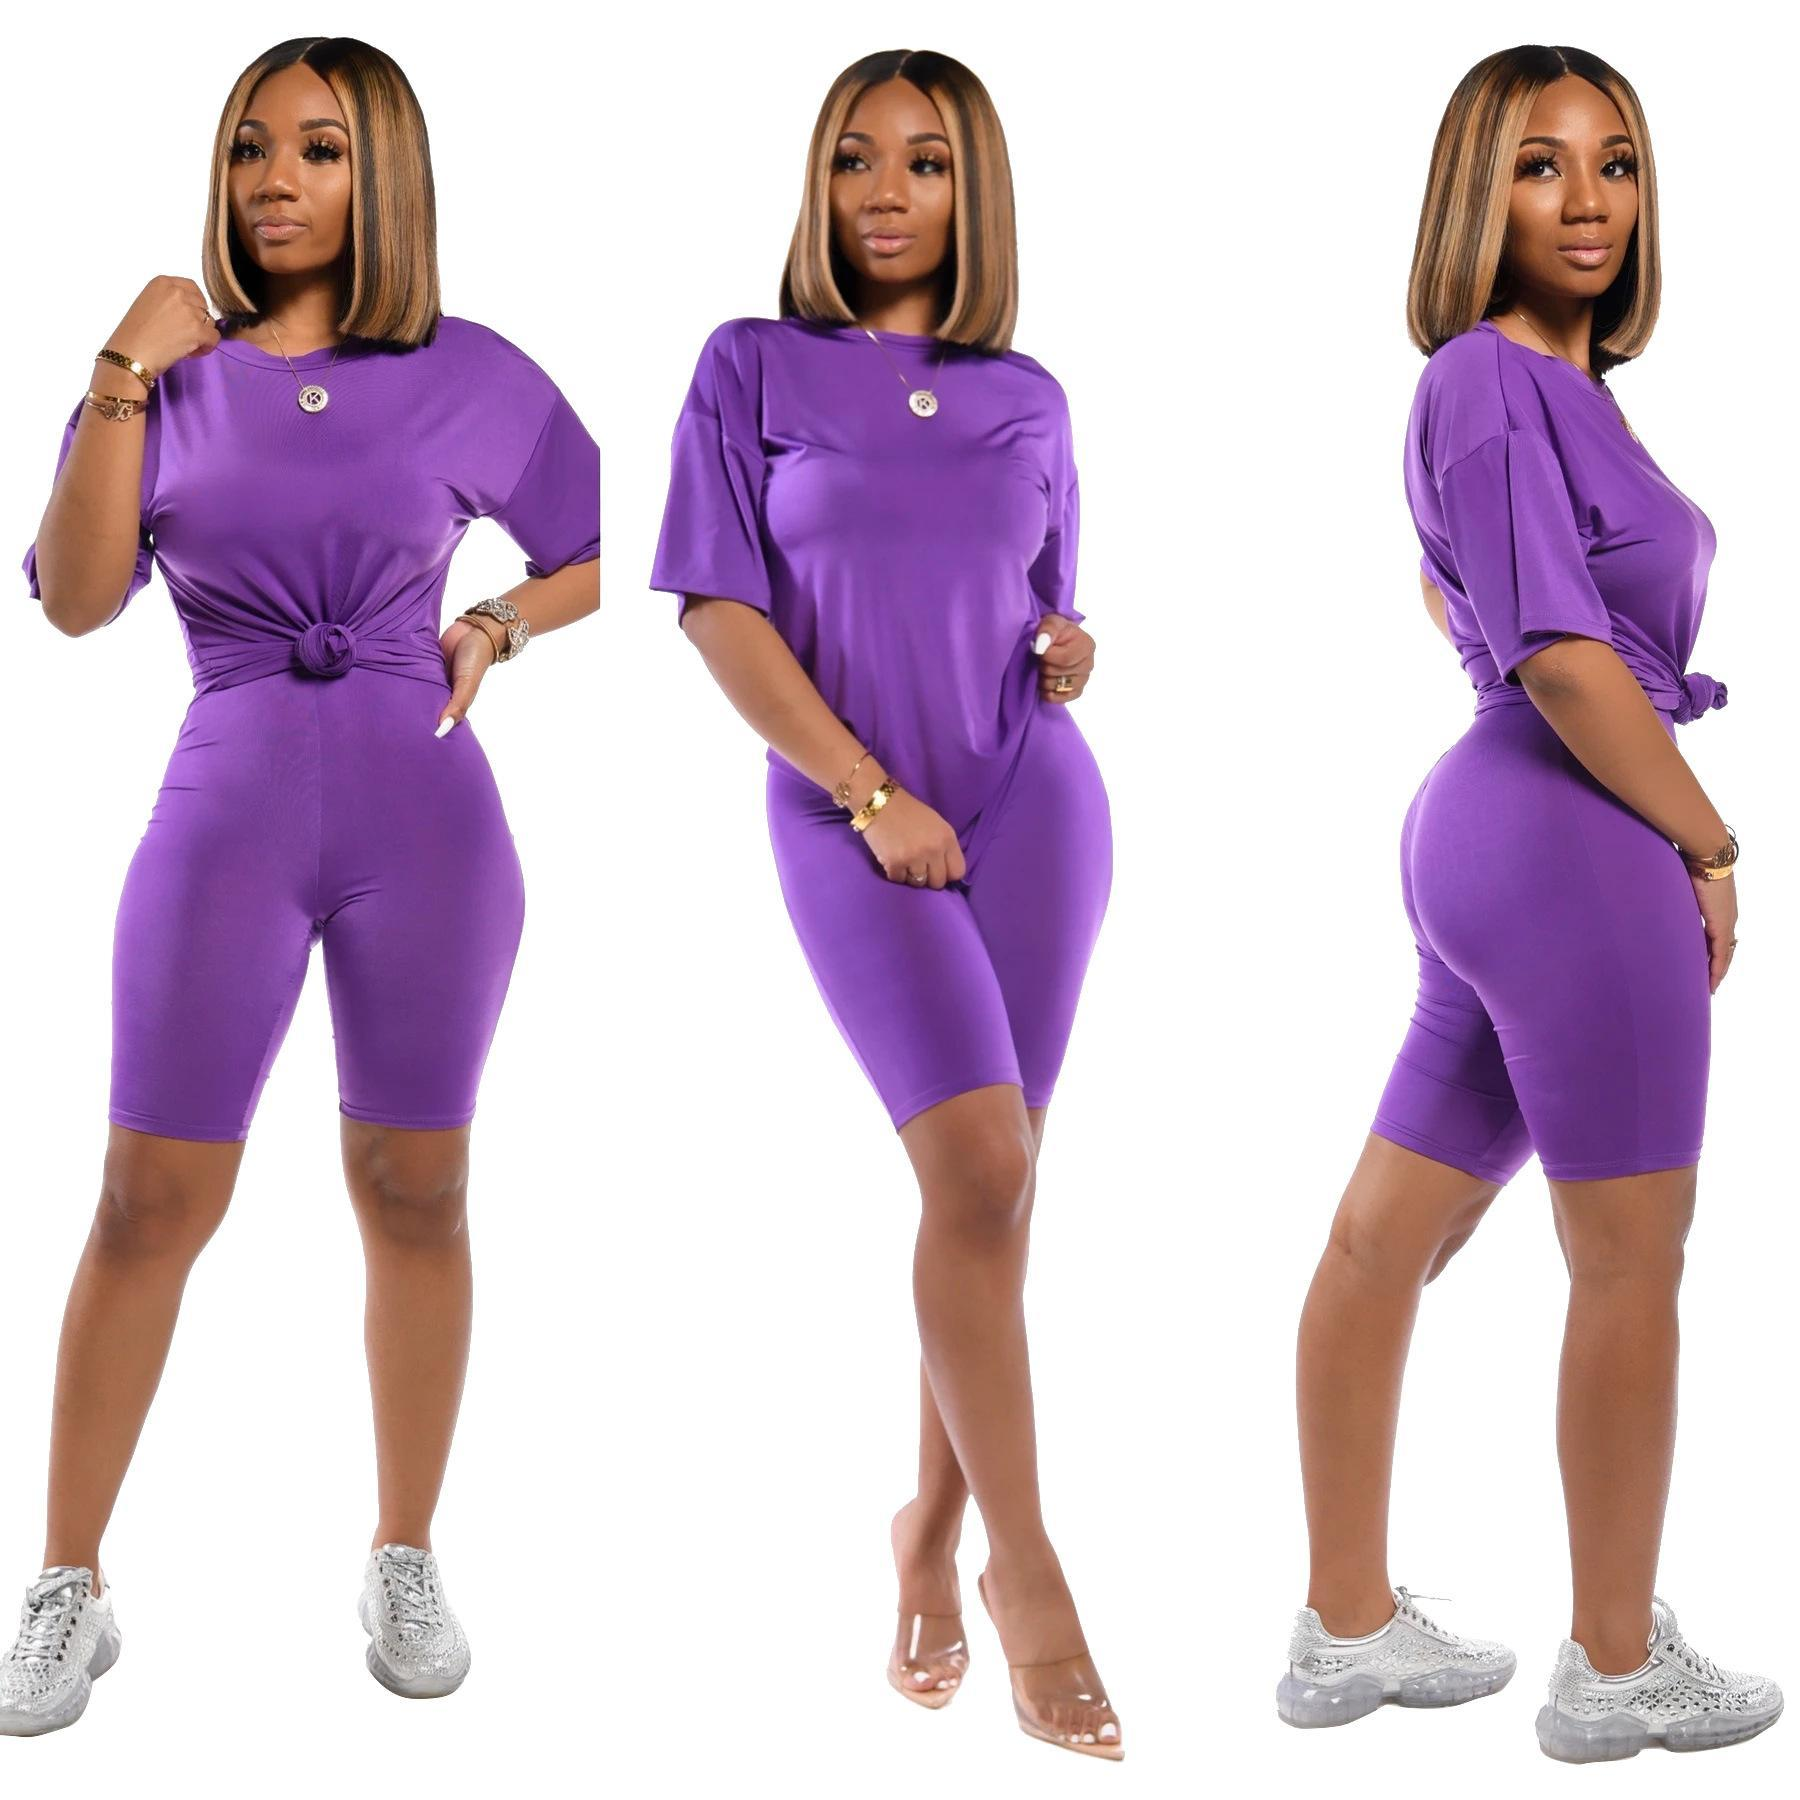 S-3XL Designer womens 2 two piece outfits set solid t-shirt top slim leggings biker shorts pants tracksuits Jogging Clothes plus size